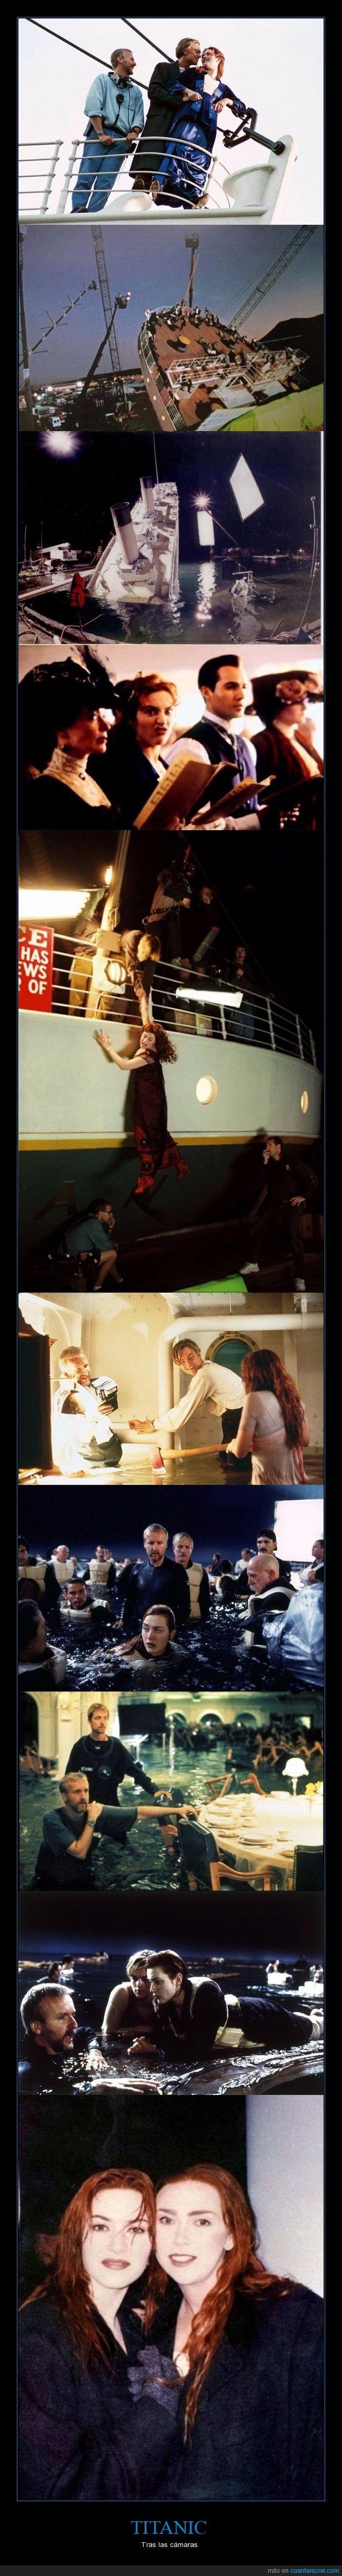 cámaras,making of,película,titanic